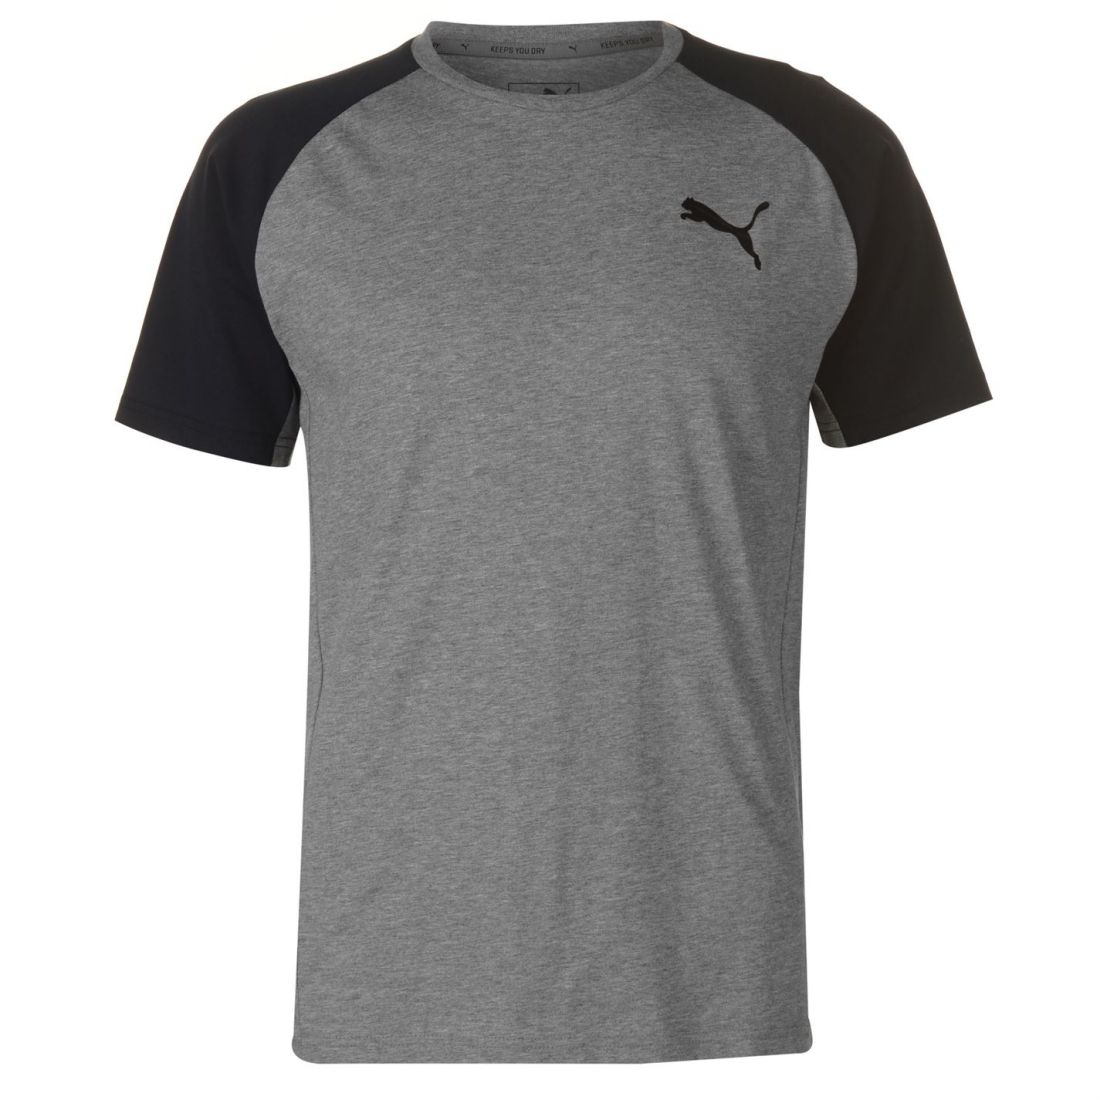 Shirt Puma Neck Sleeve Evostripe Crew Slim Mens Details About Short T Raglan Top Fit Tee qSLpjVGUzM